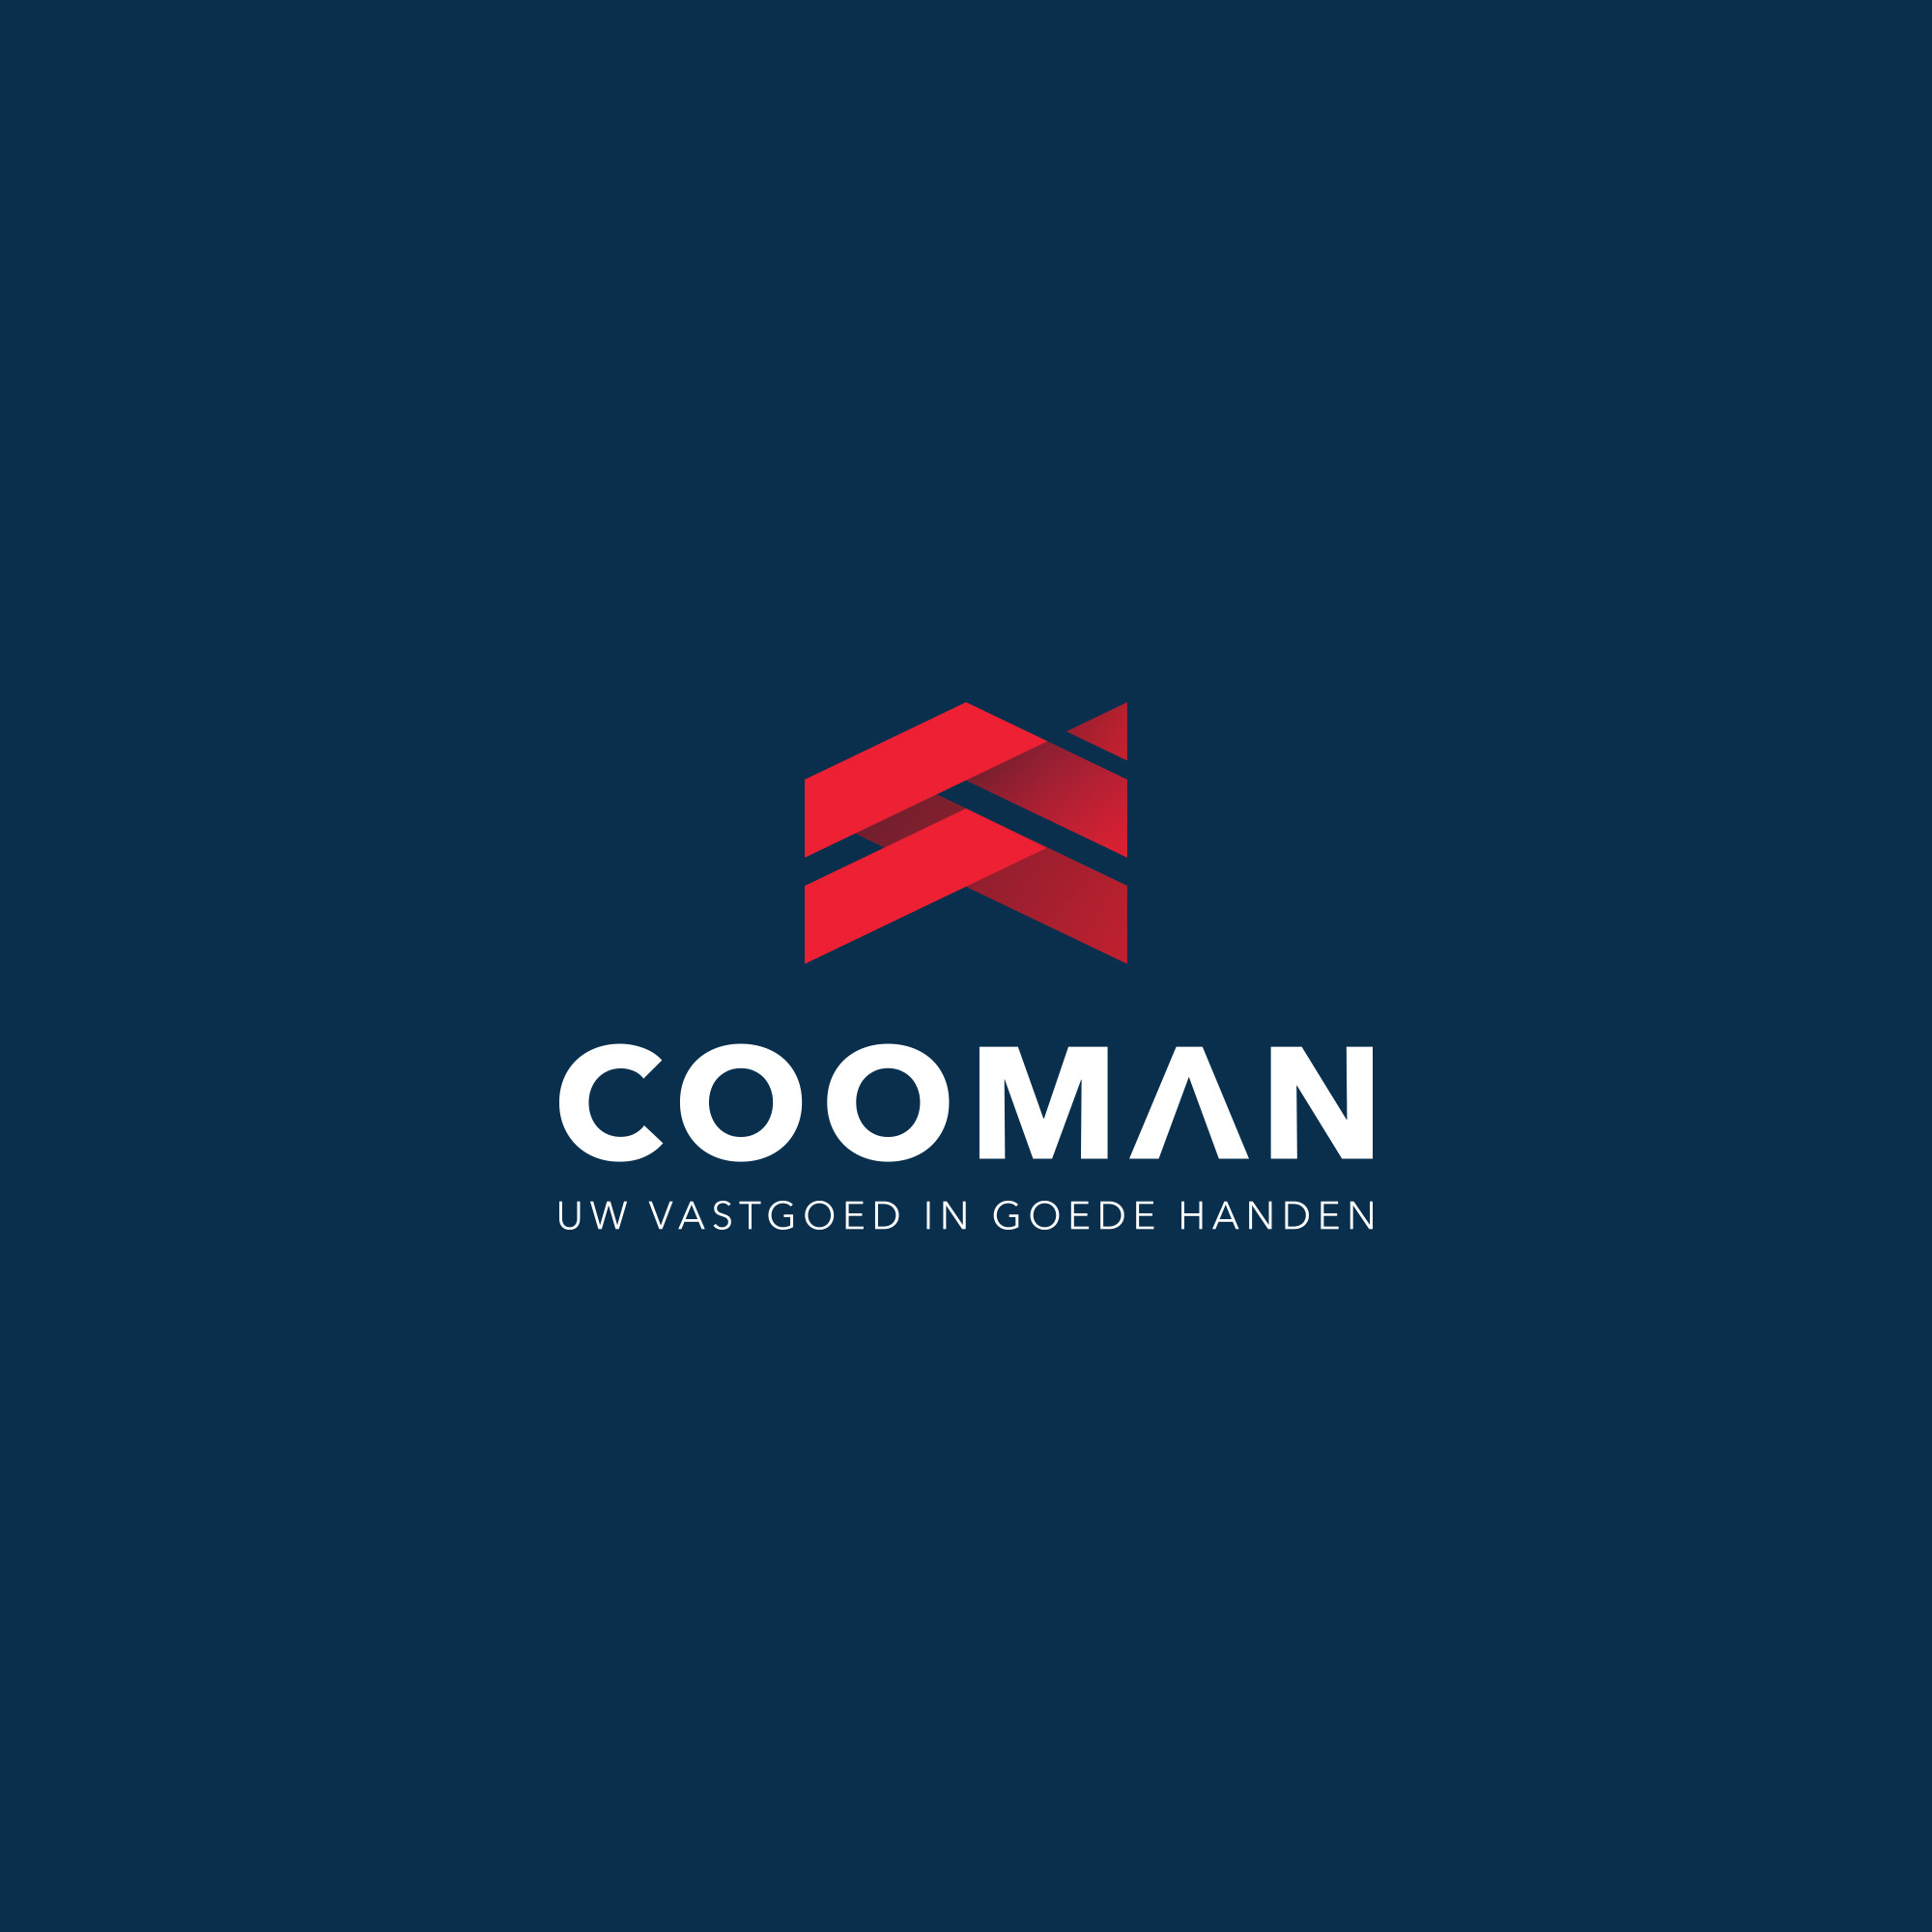 https://sconcept.be/wp-content/uploads/2020/01/logo-cooman-1.jpg